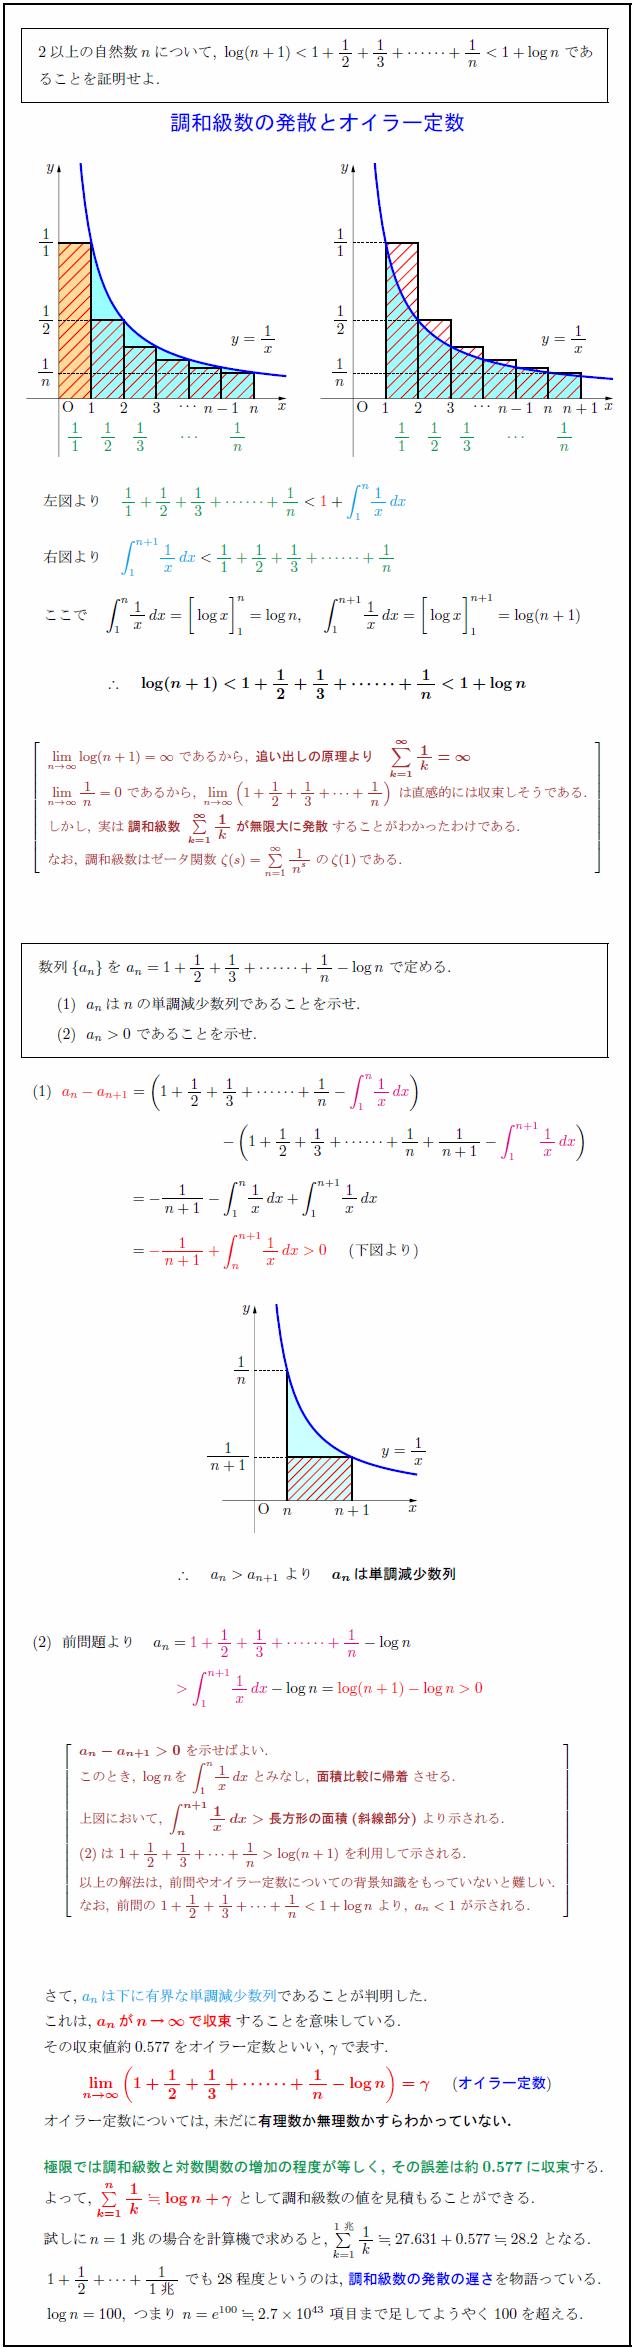 harmonic-series-euler-constant